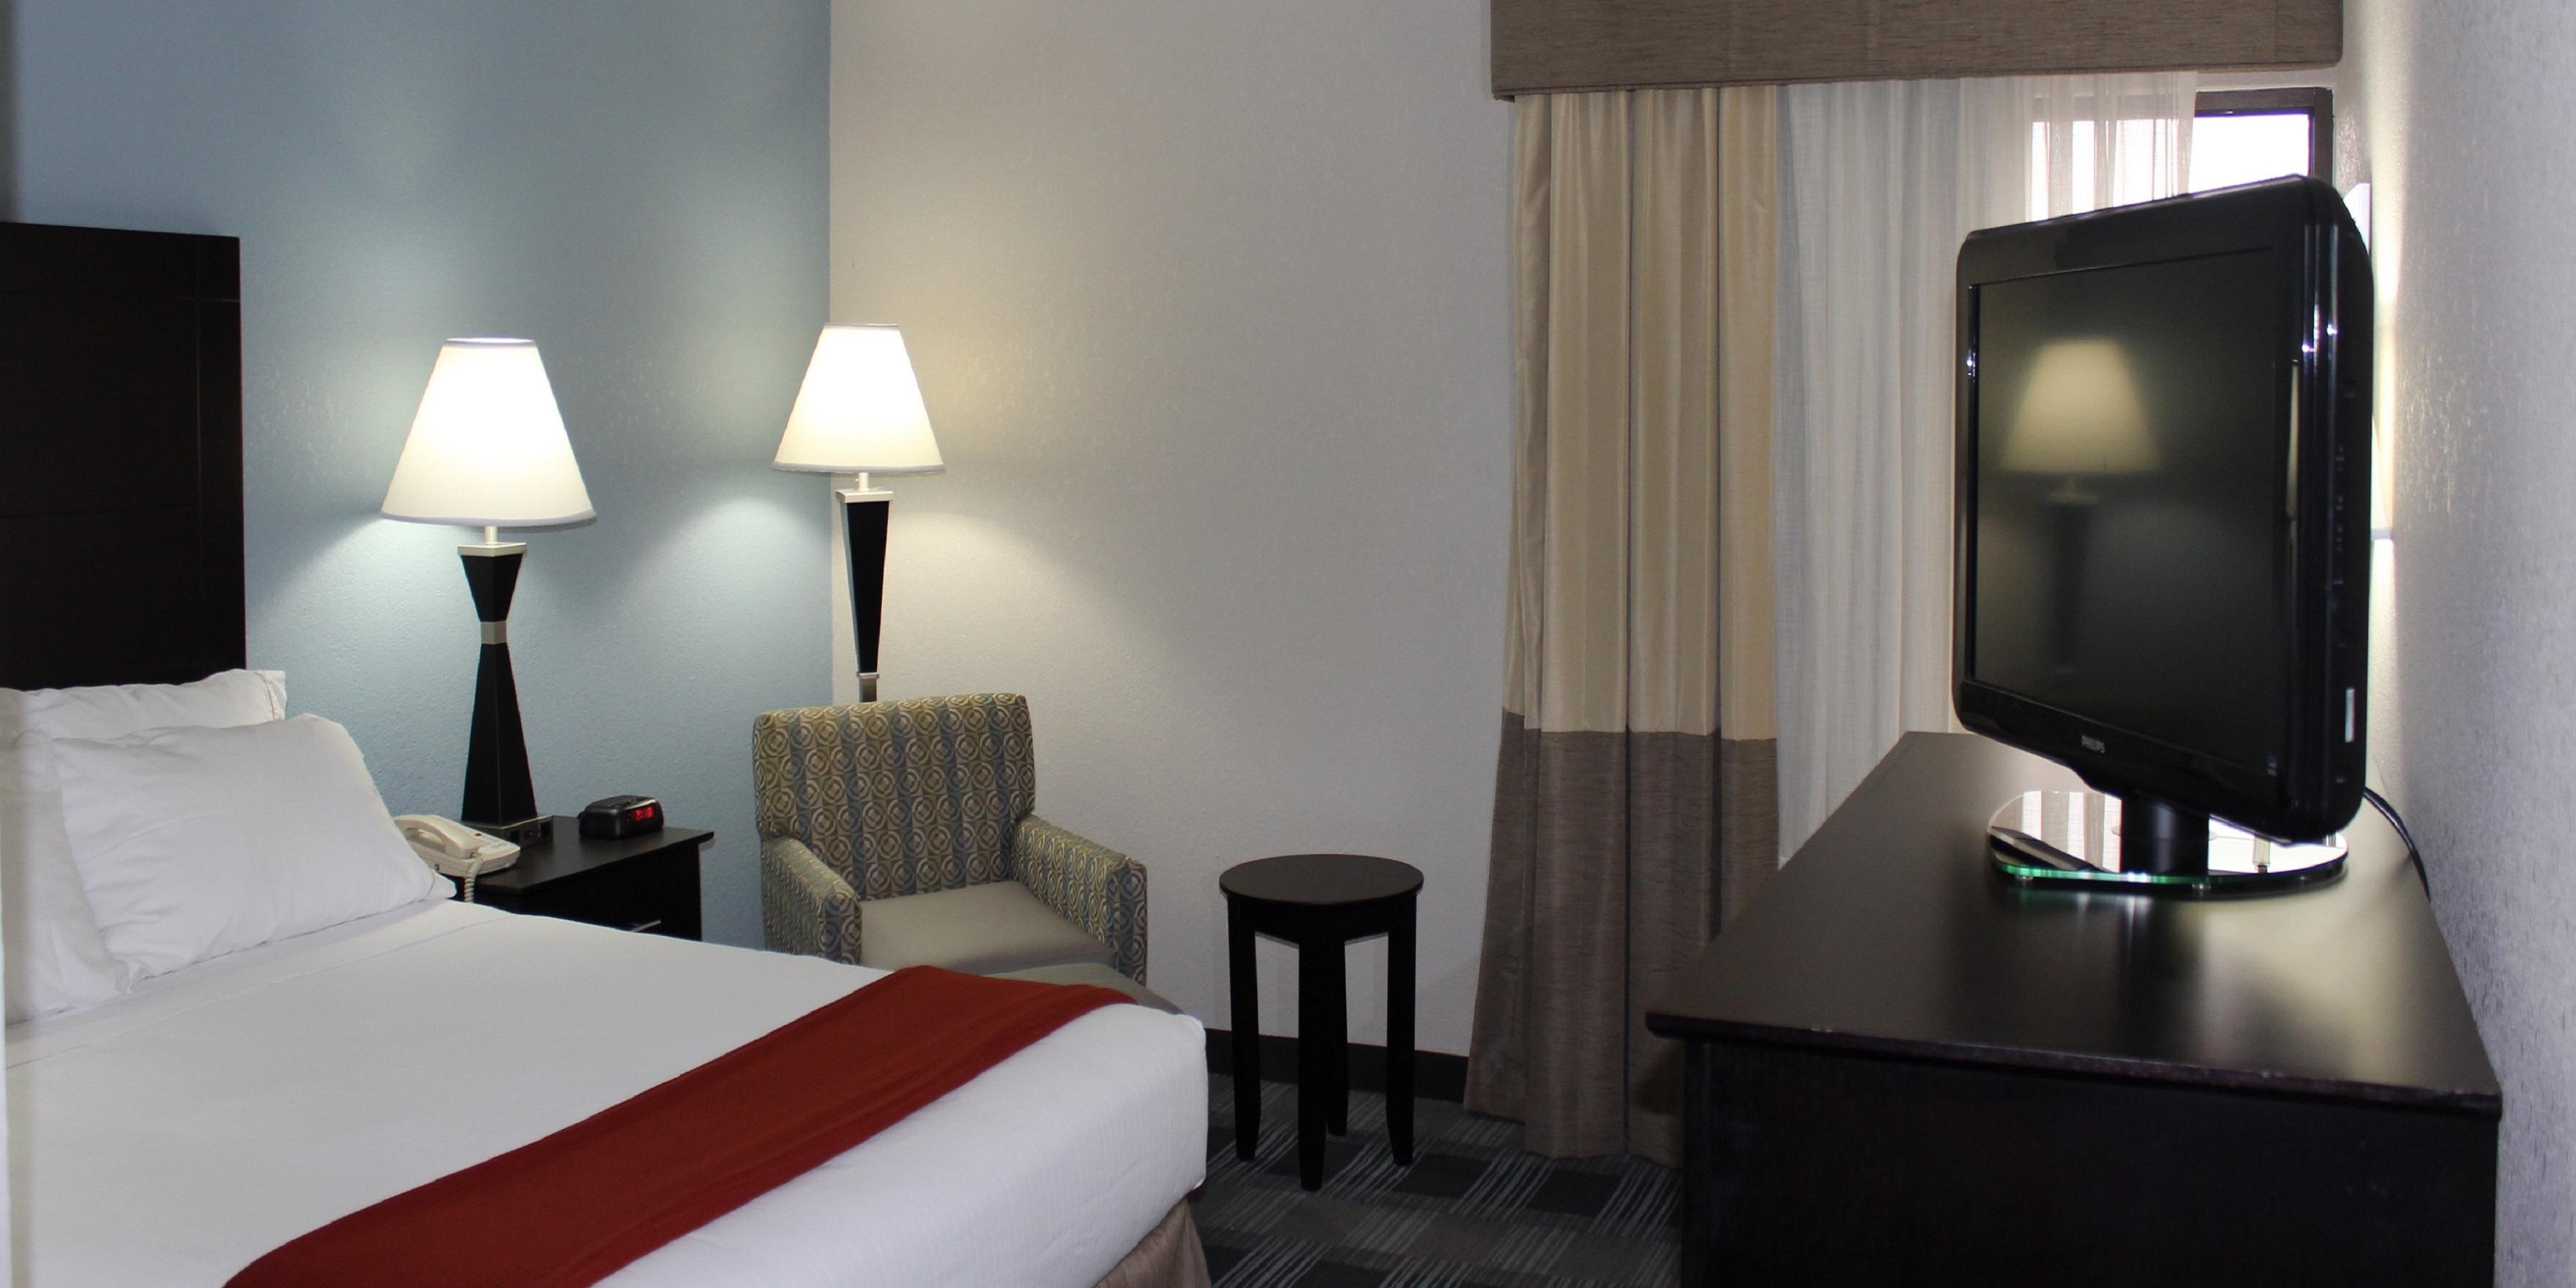 Holiday Inn Express Forsyth 3576335125 2x1